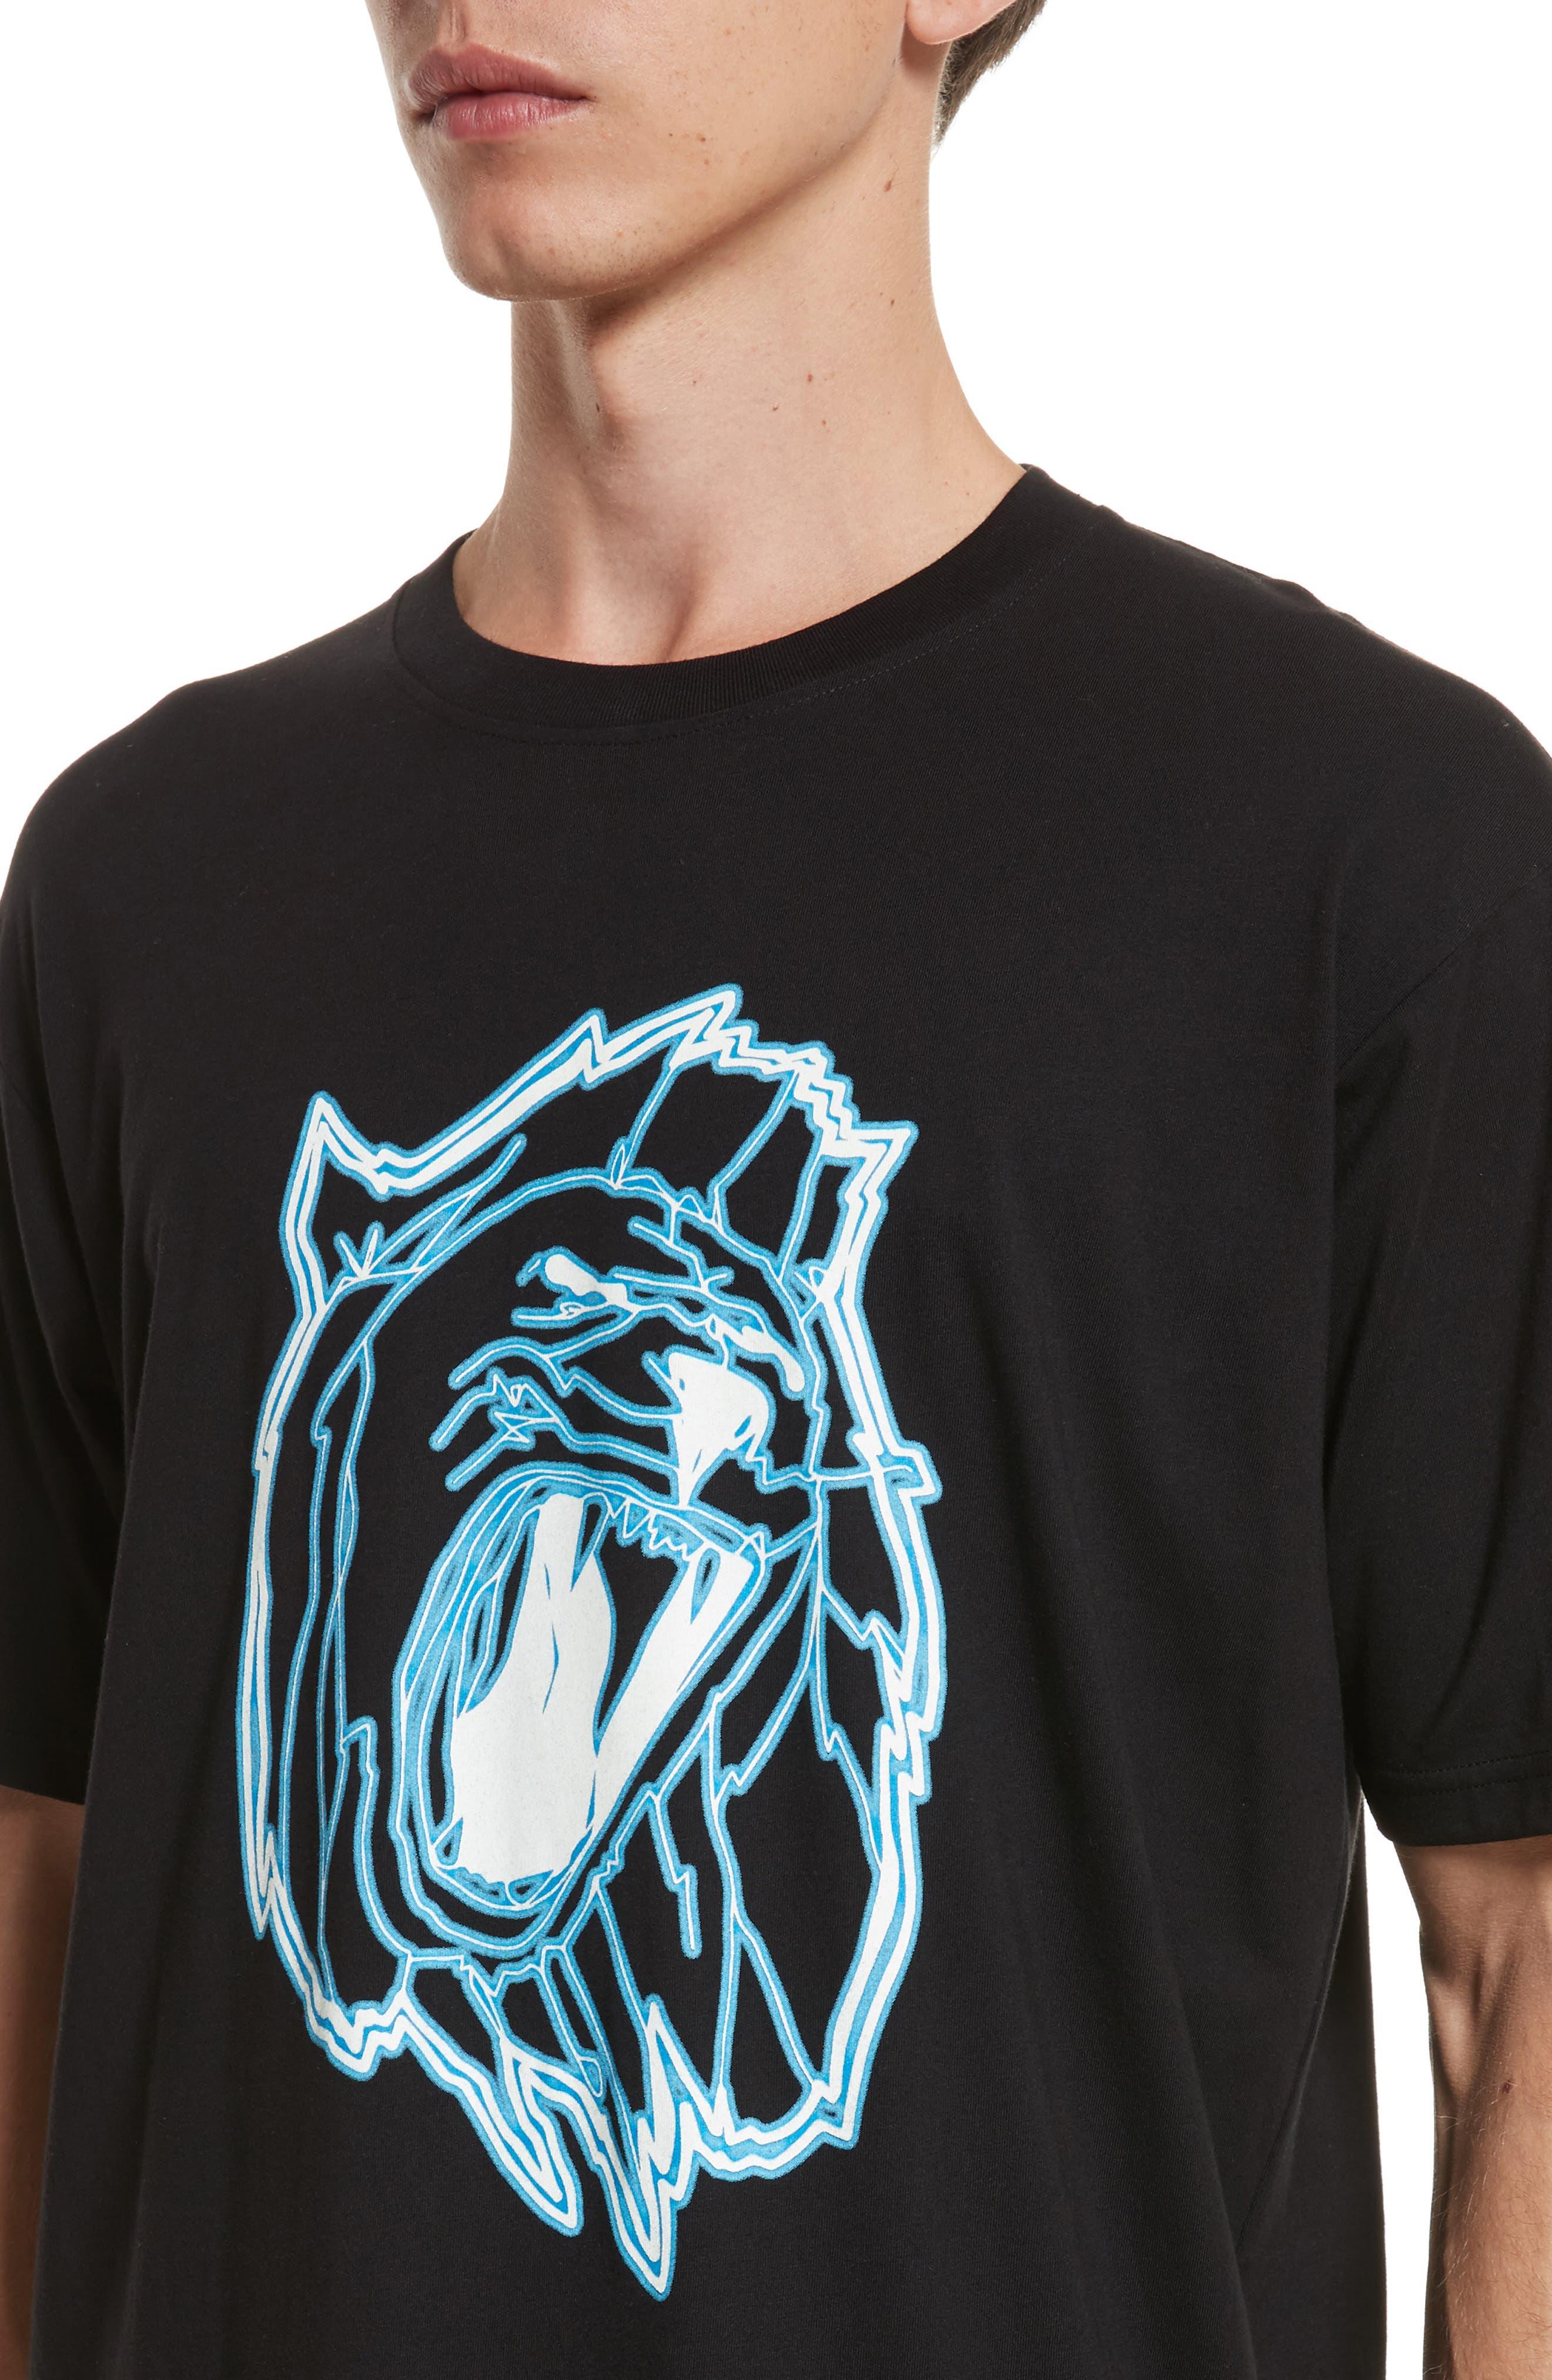 VERSUS by Versace Electric Lion Graphic T-Shirt,                             Alternate thumbnail 4, color,                             005